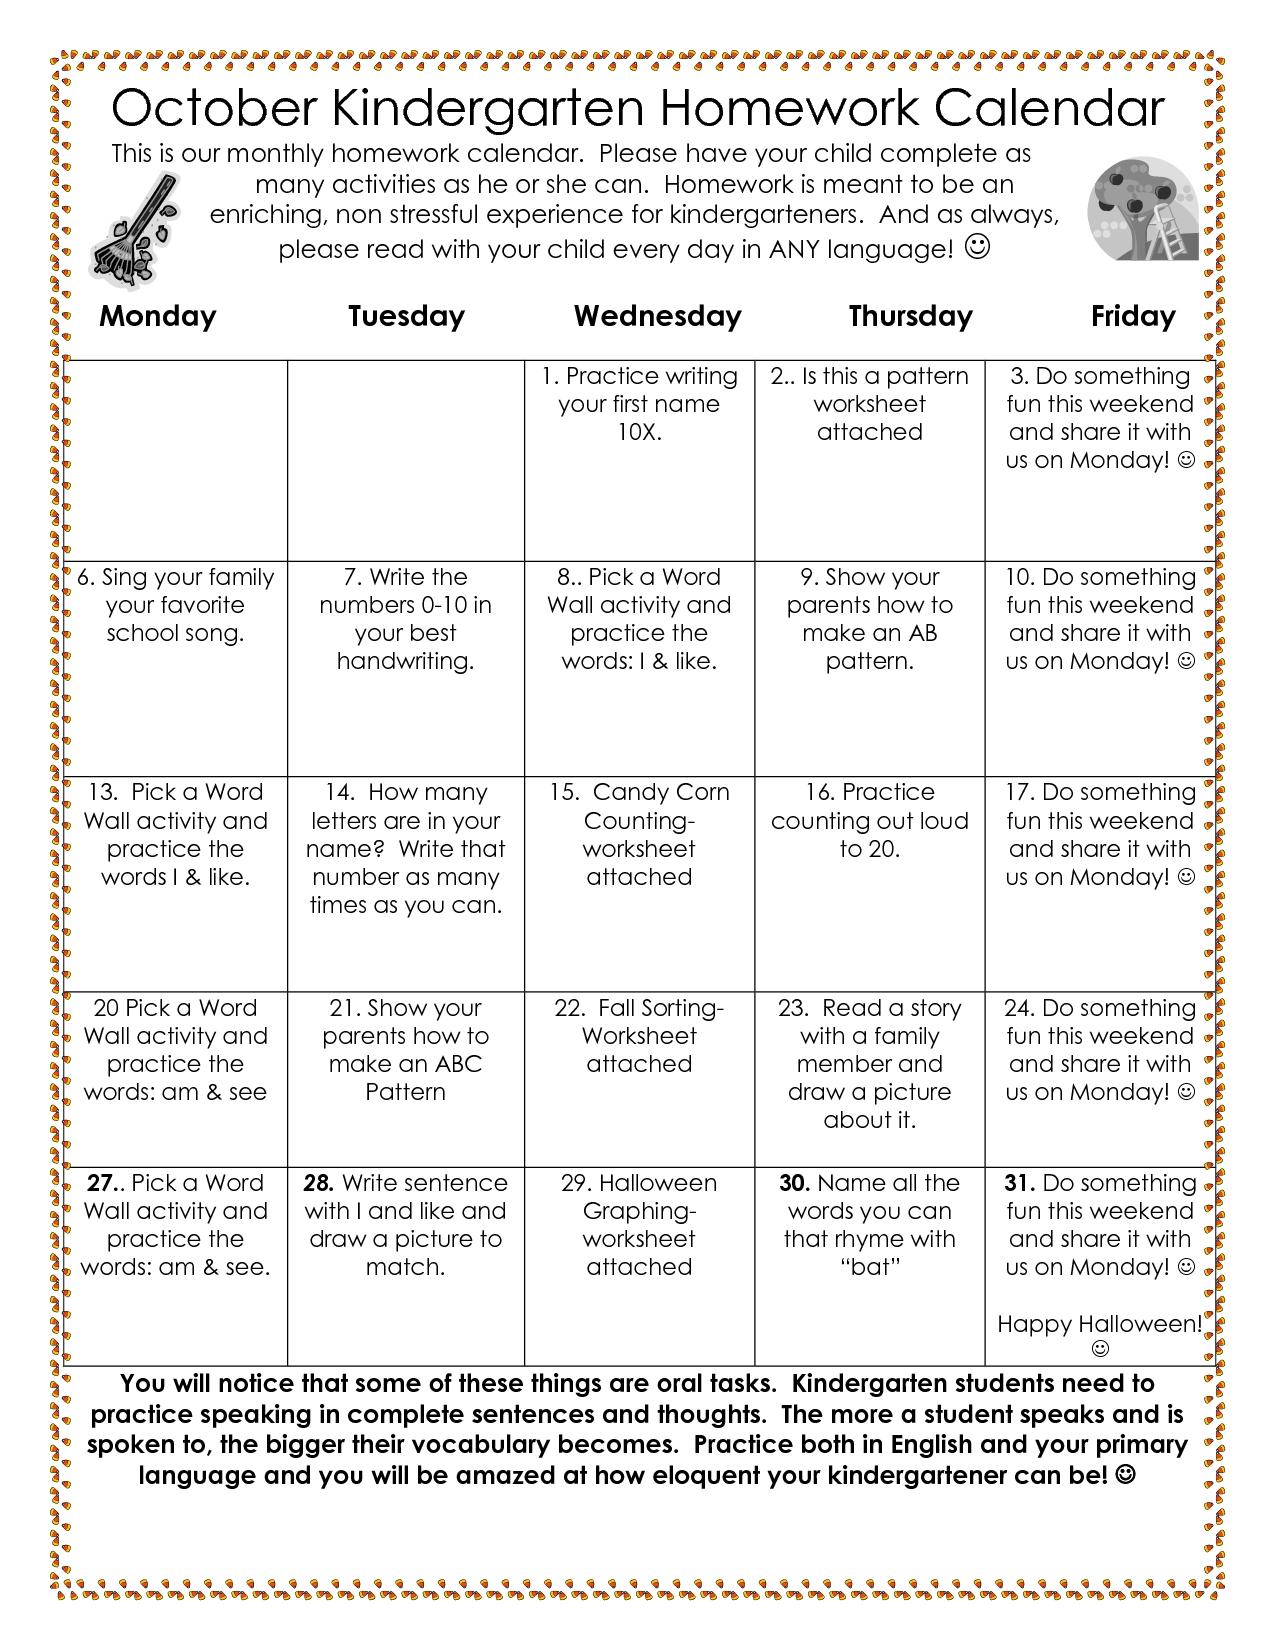 Pre-K Monthly Homework Calendar • Printable Blank Calendar